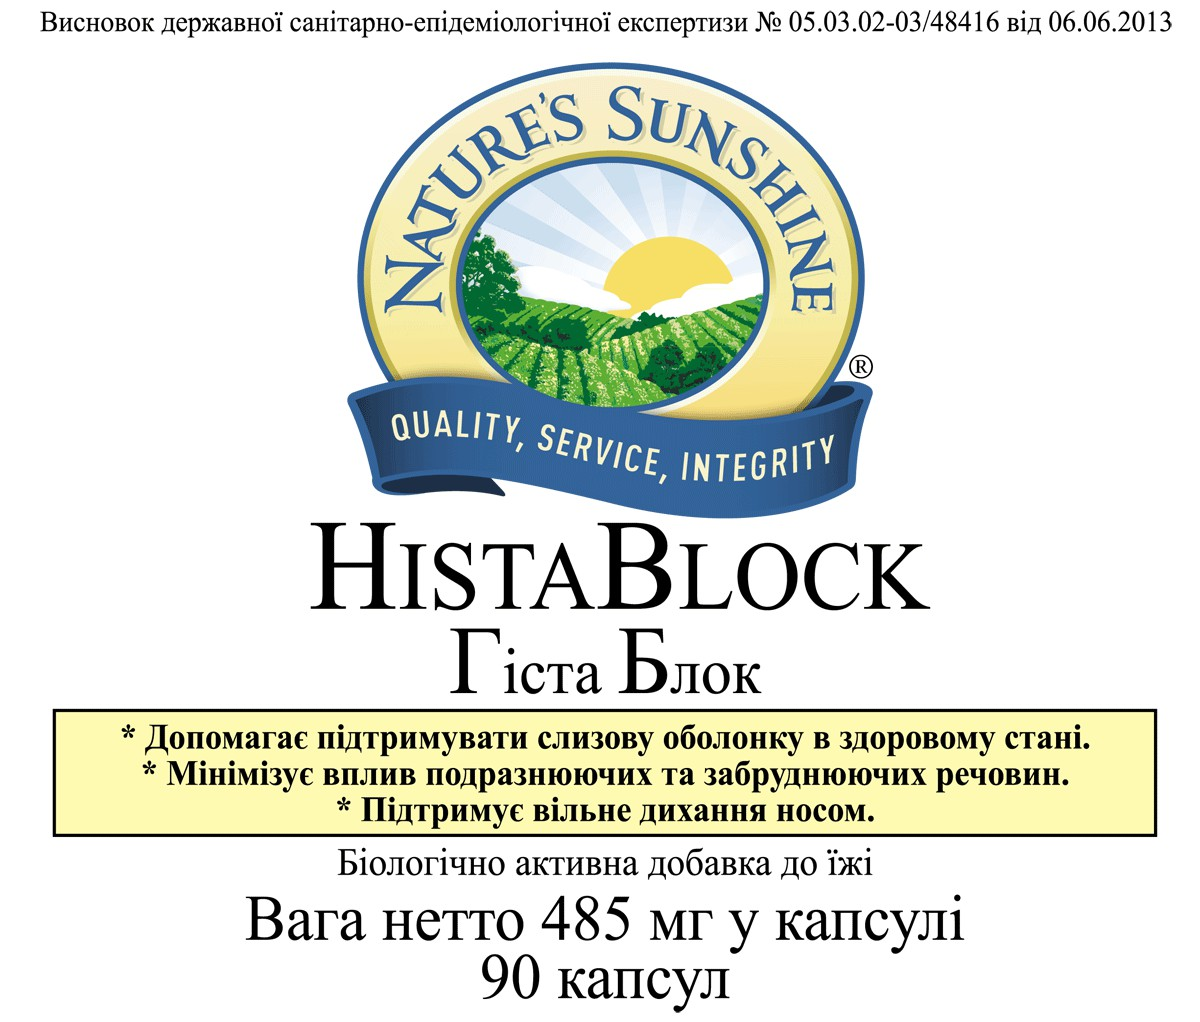 Набор 1+1: Hista Block [776] (1шт) + Compact Powder «Powder Sugar» [62202] (1 шт) (годен до 01.2018)